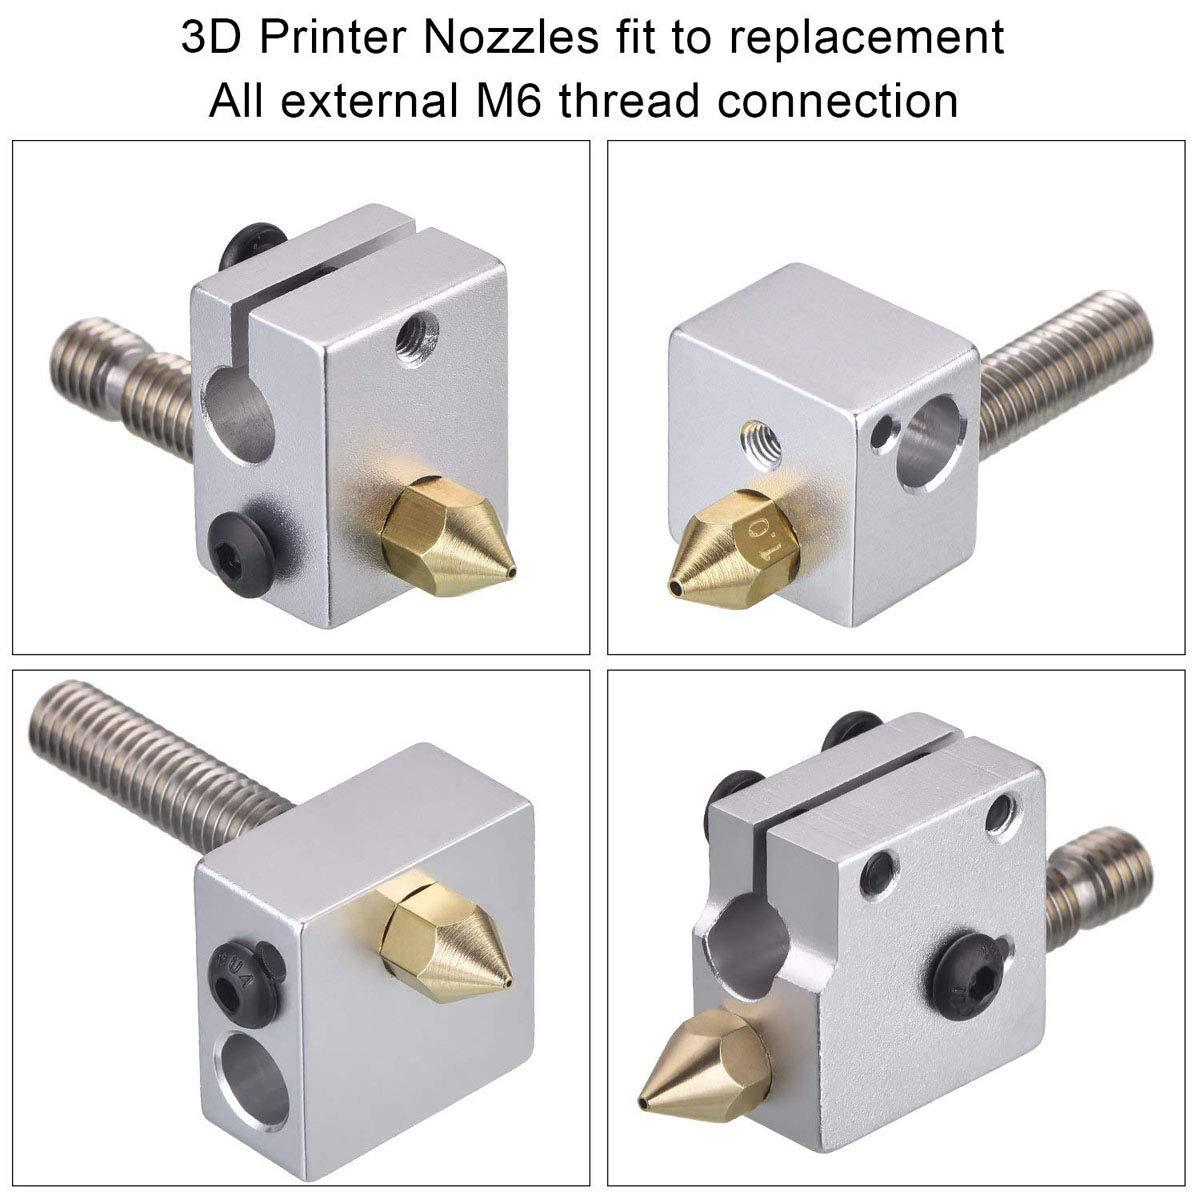 Samje 5pcs M6*30mm Teflon PTFE Extruder Nozzle Throat 1.75mm for MK8 Makerbot Reprap 3D Printers